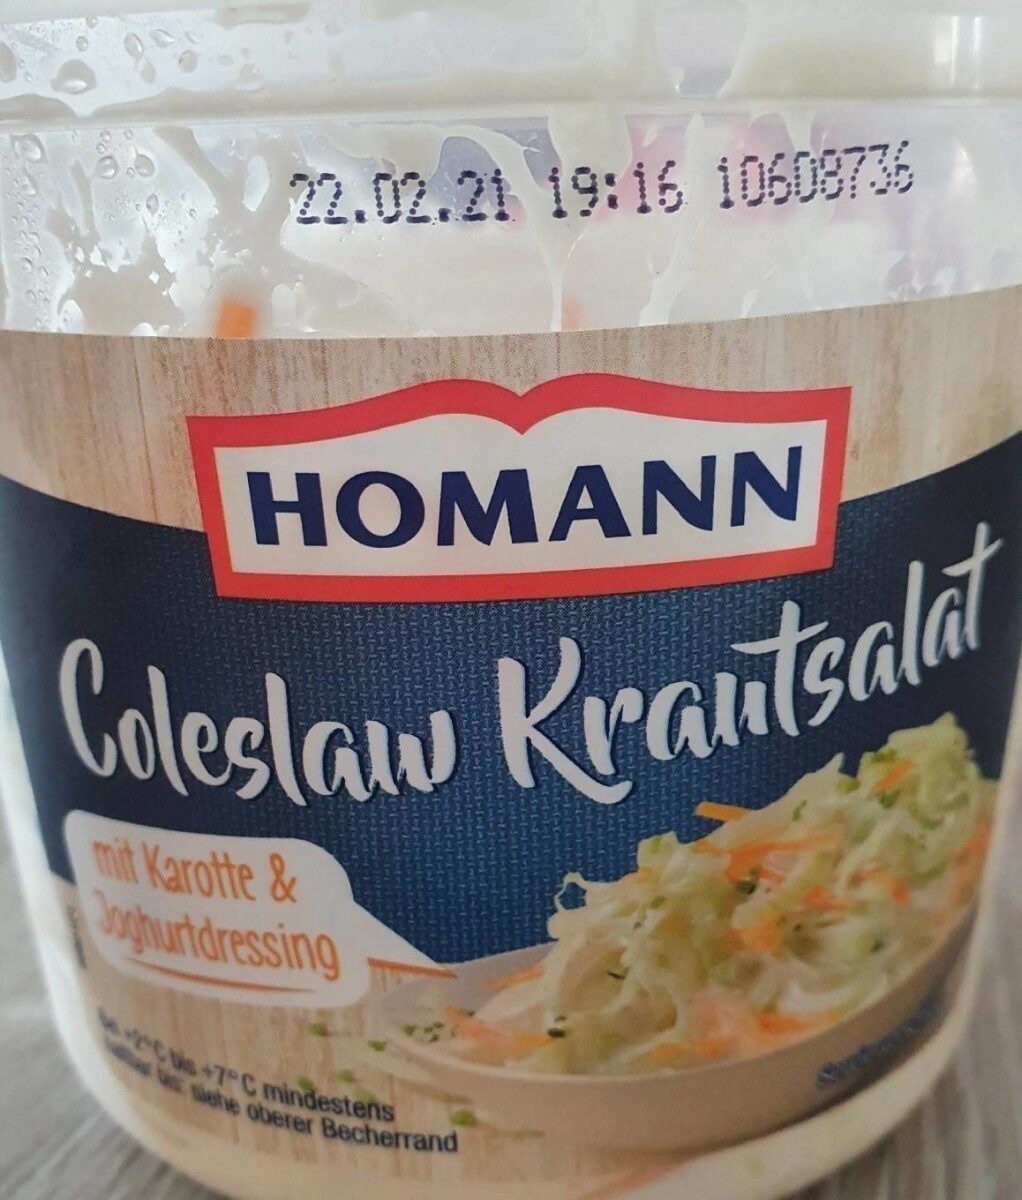 Homann Coleslaw Krautsalat - Prodotto - de